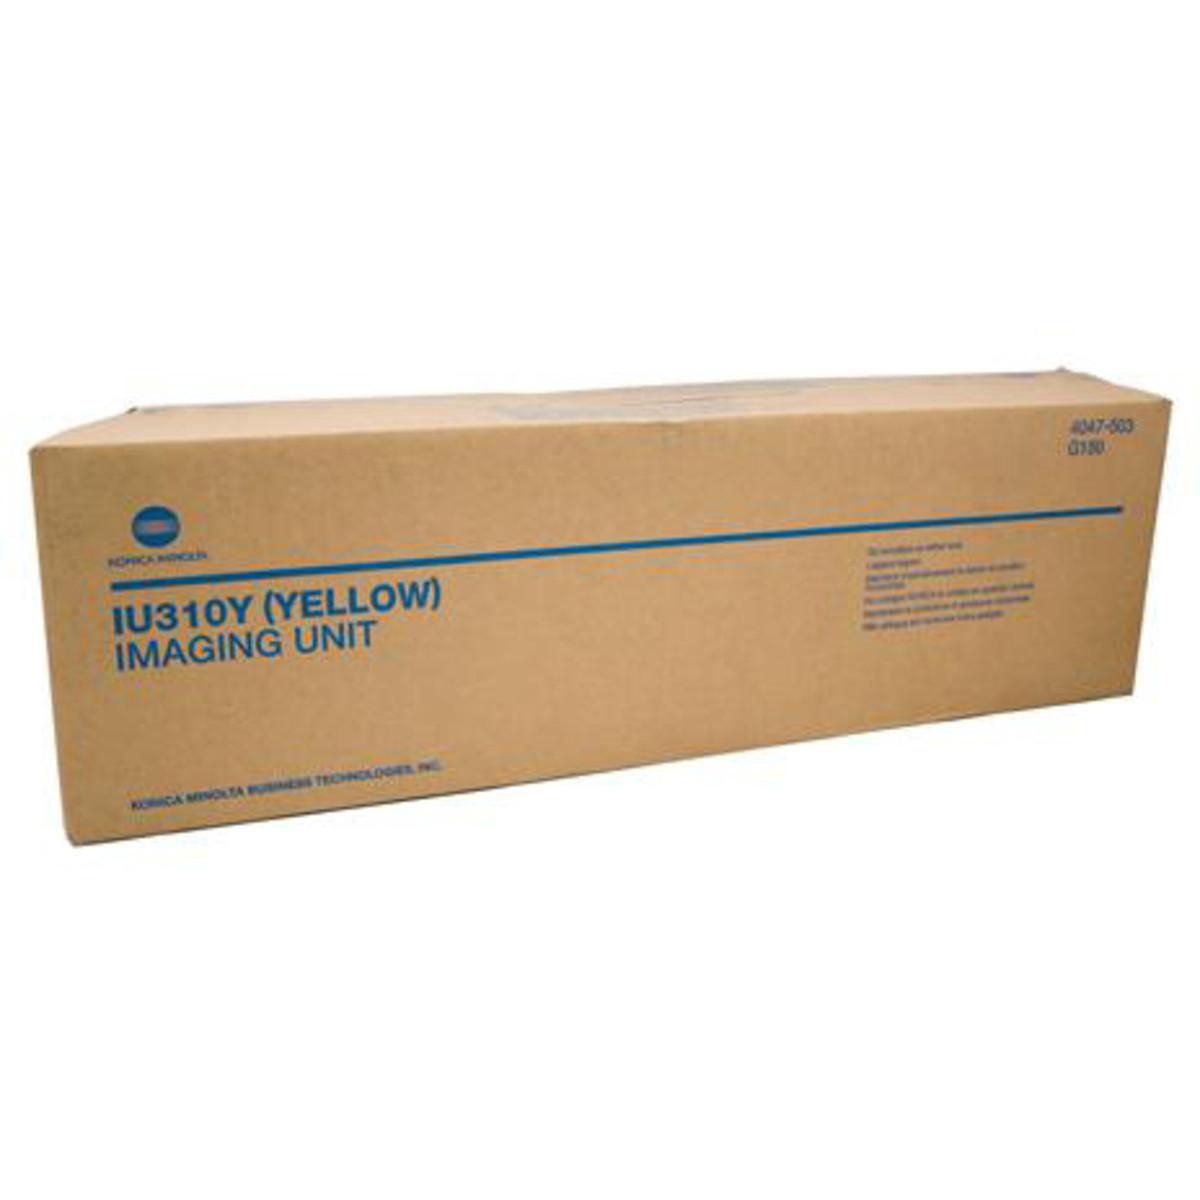 Konica Minolta 4047-503 Yellow Drum Unit